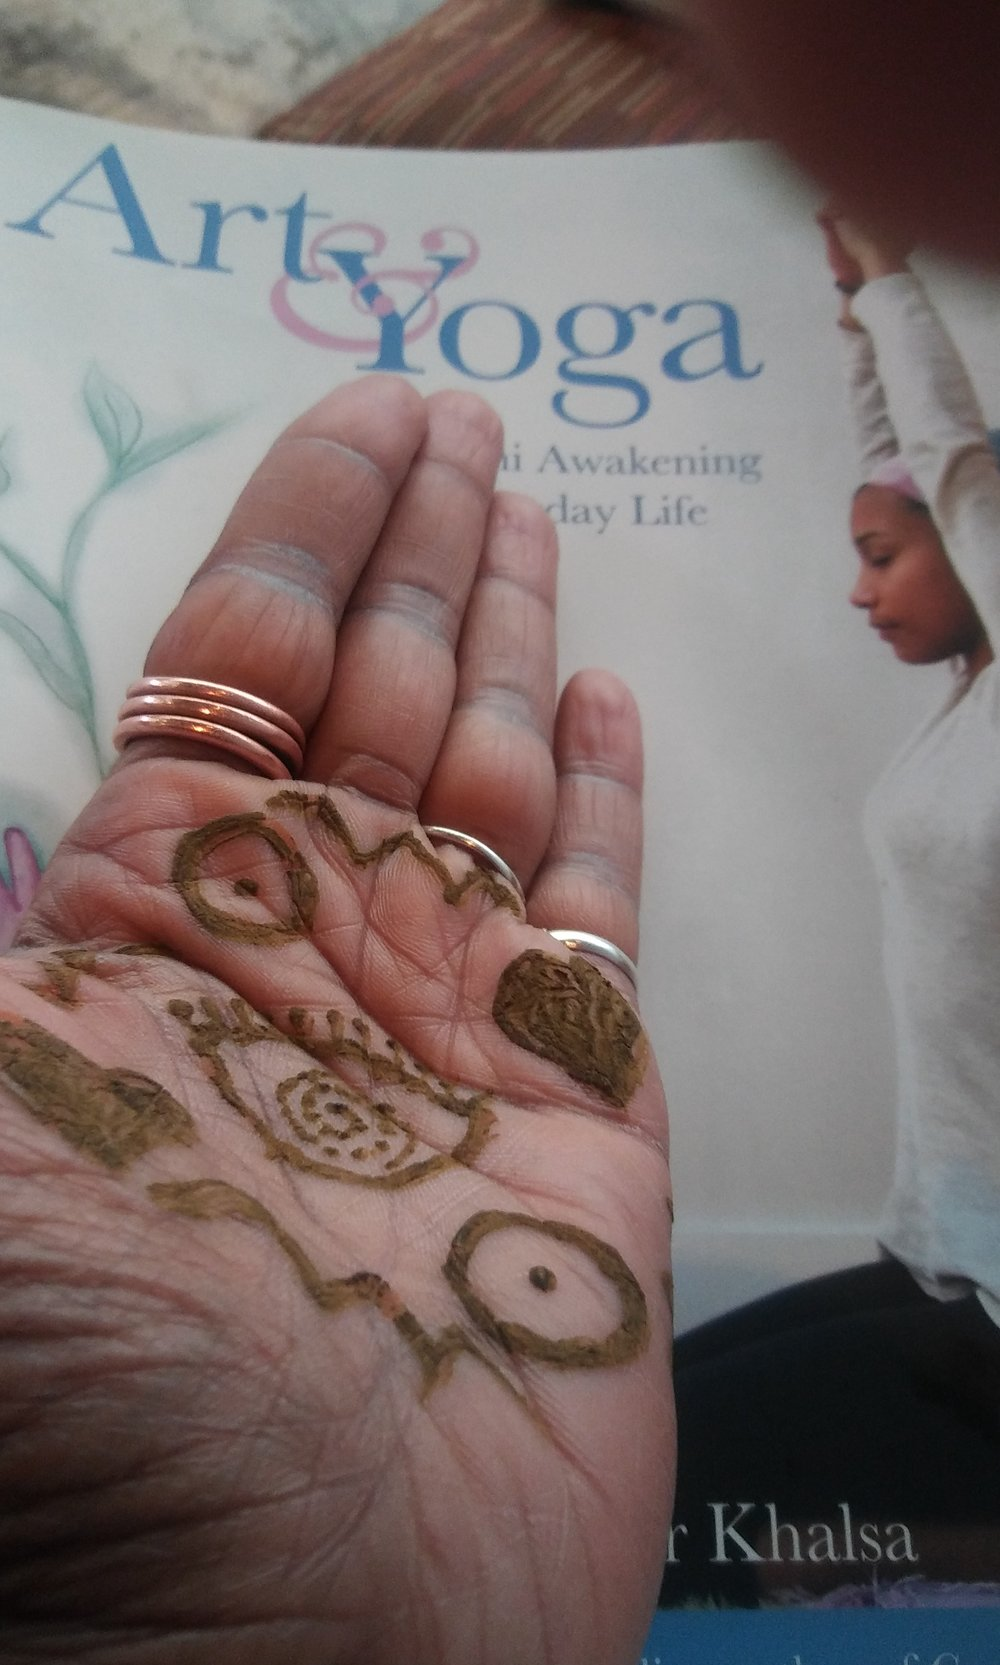 MutShat facilitates Sacred Art and Yoga classes.